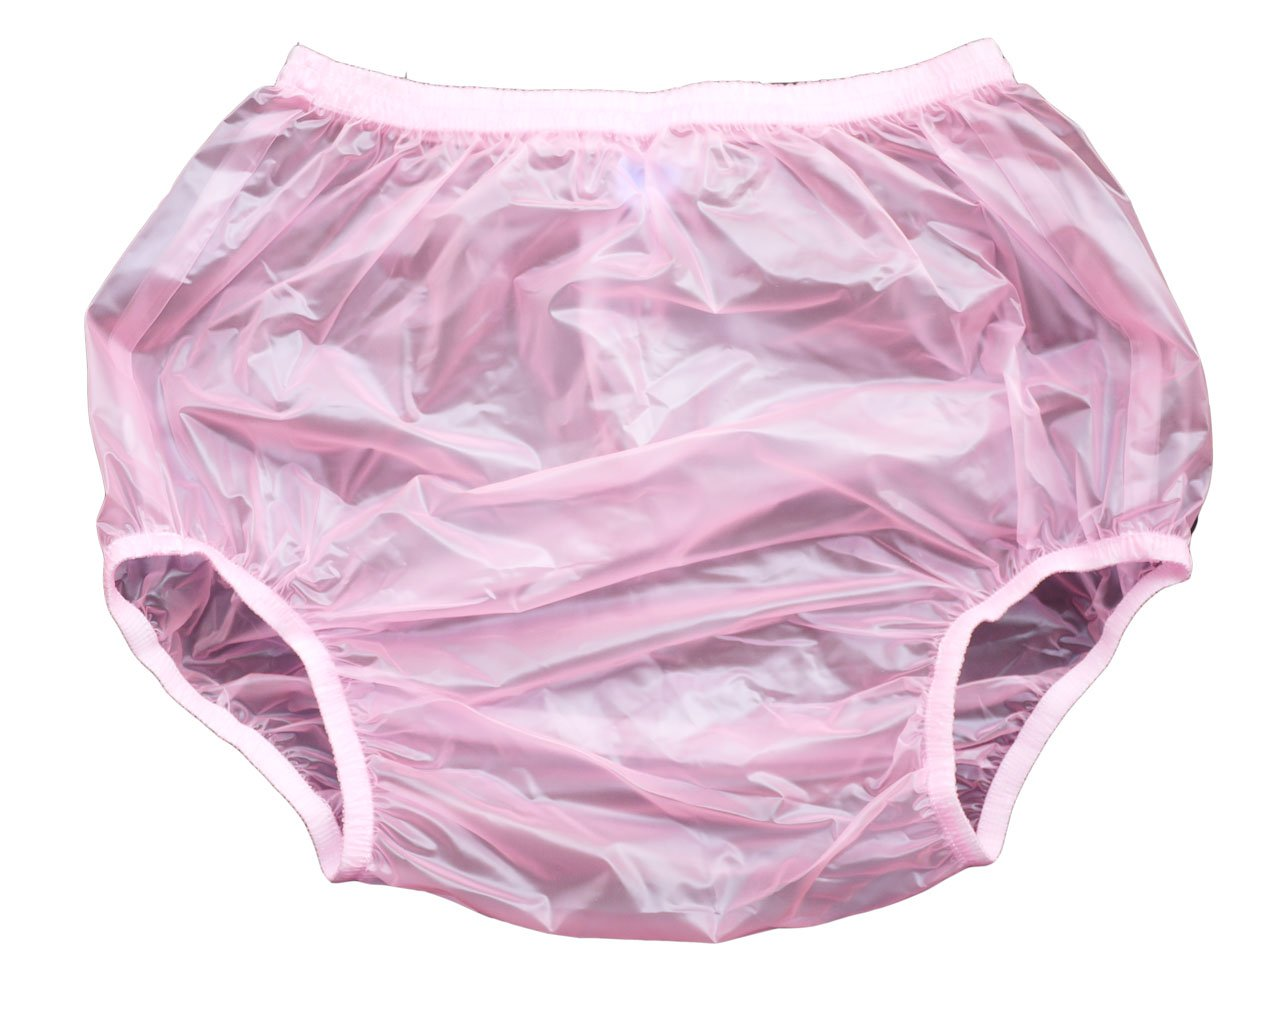 Haian adulto pañales pantalones pantalones de plástico color rosa Talla:XLarge Lang Kee